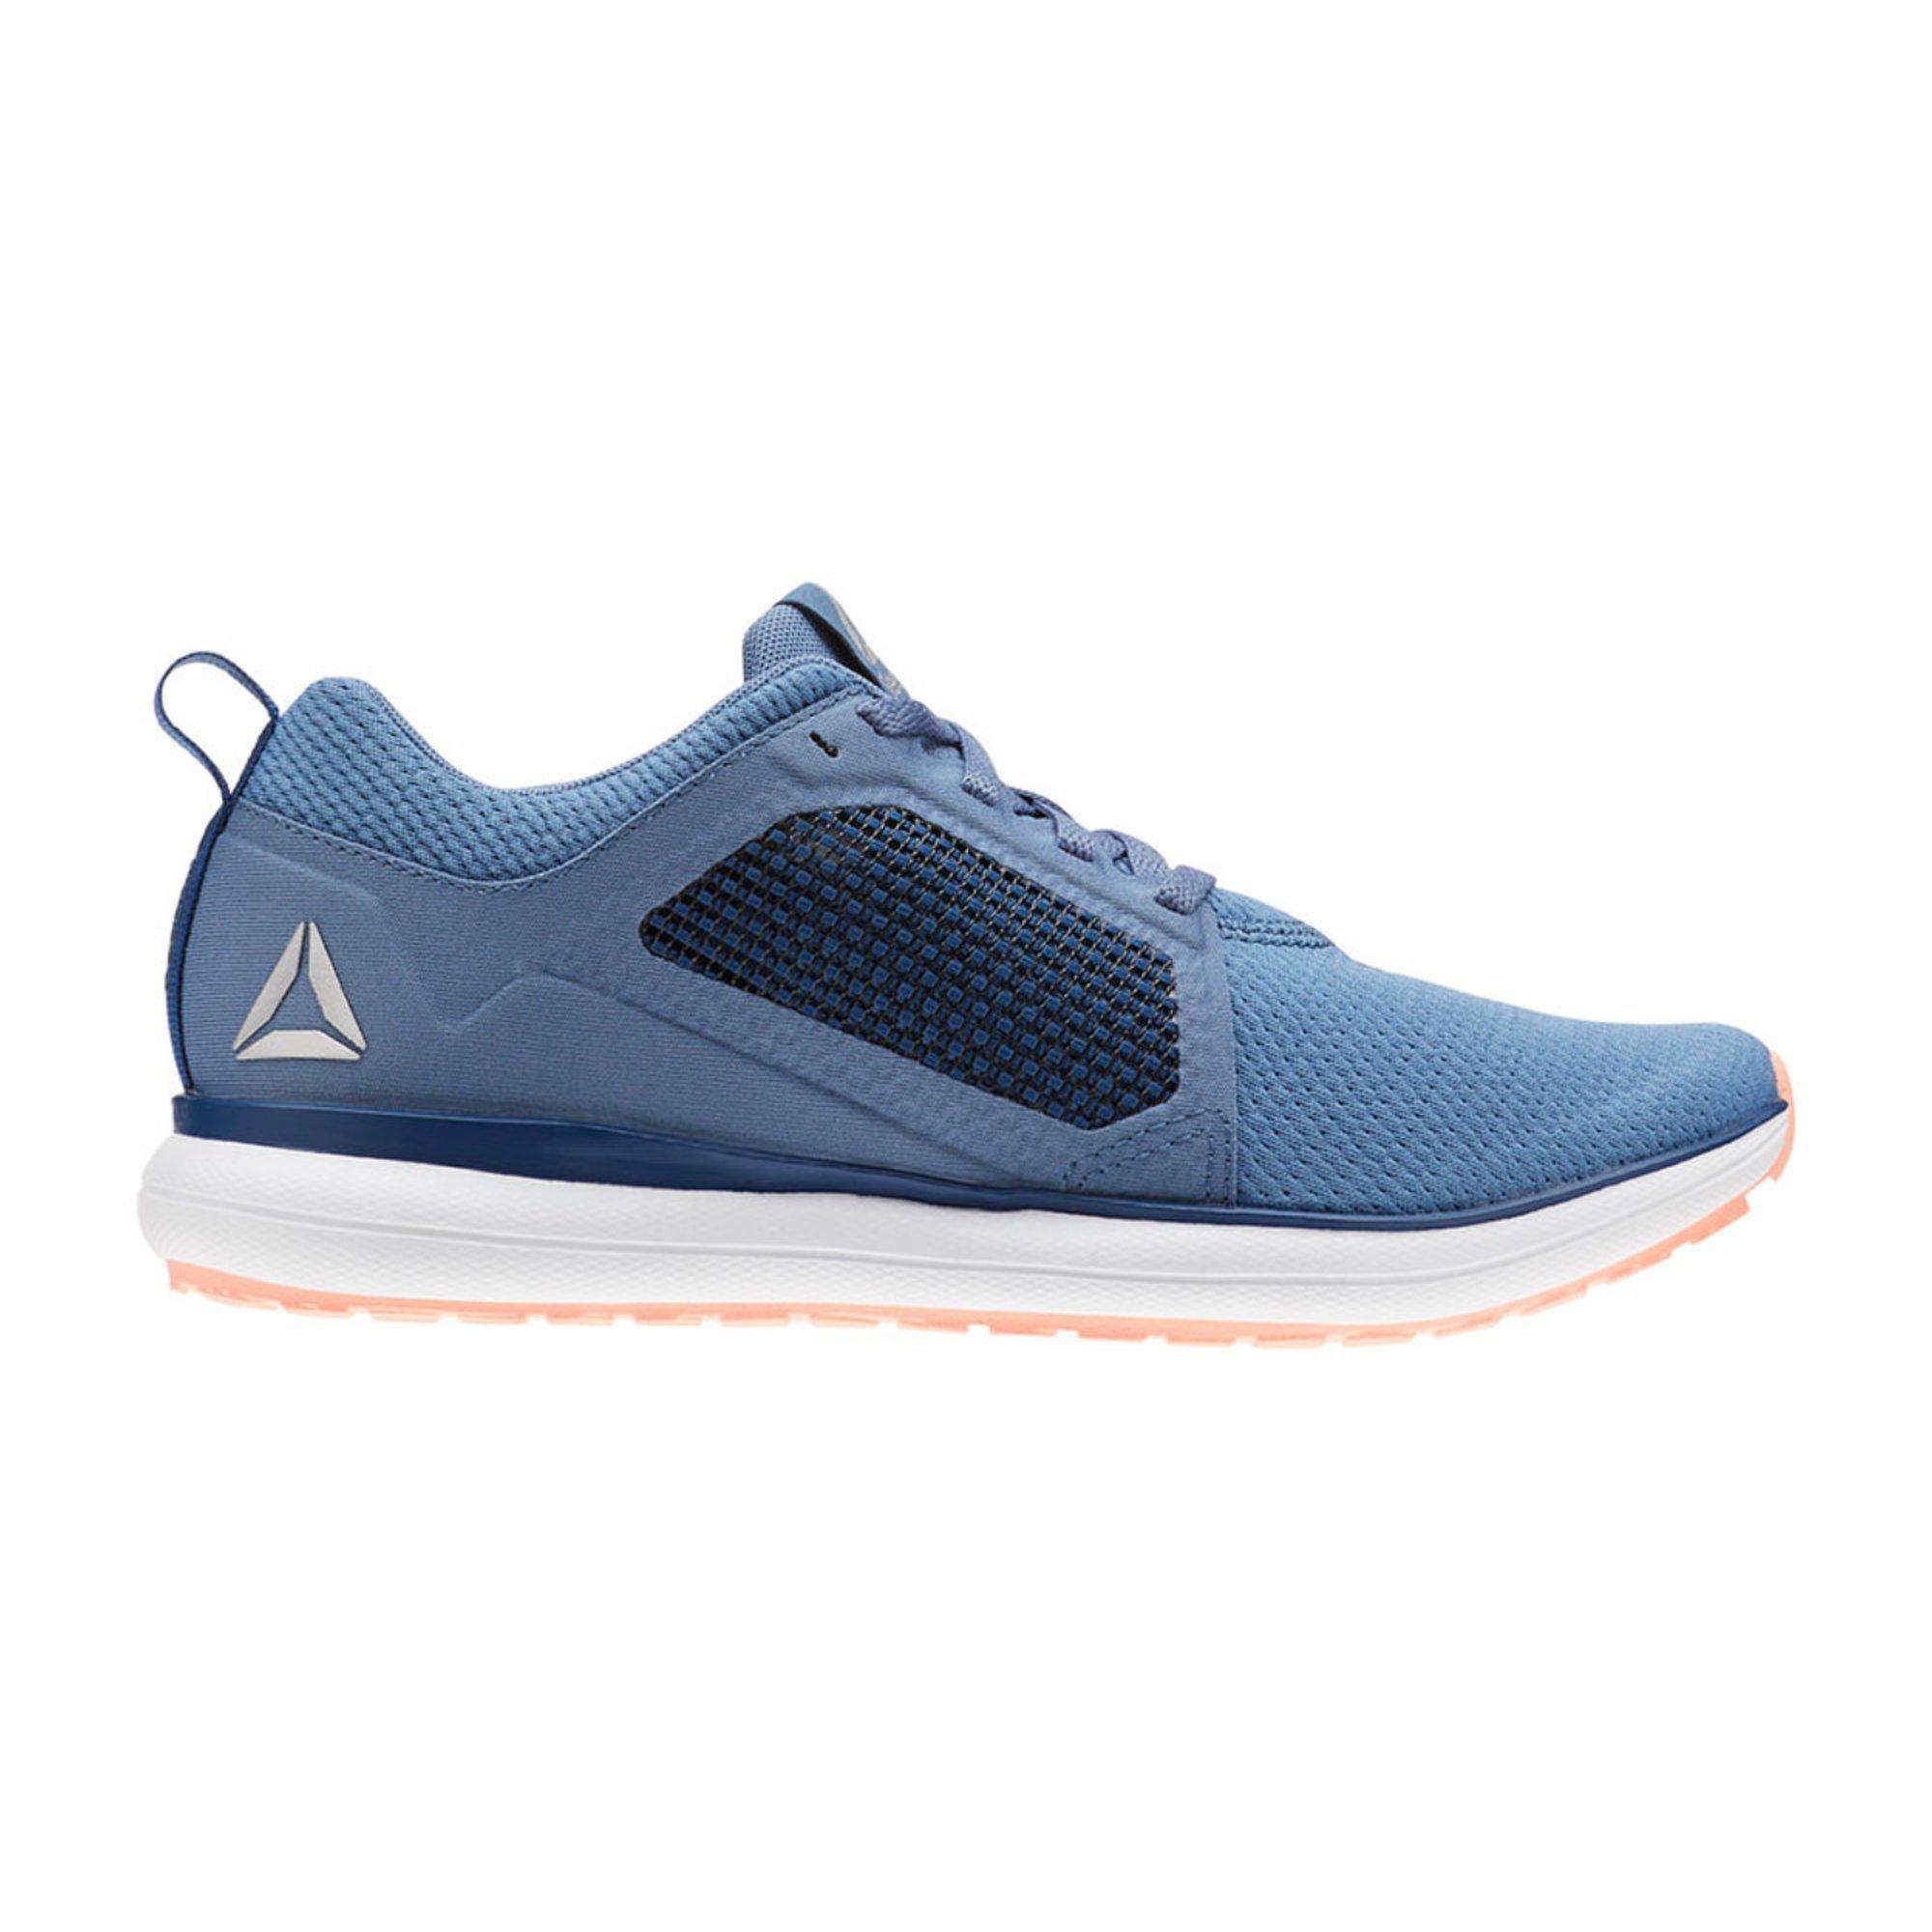 8db69791638ec Reebok Women s Driftium Ride Running Shoe